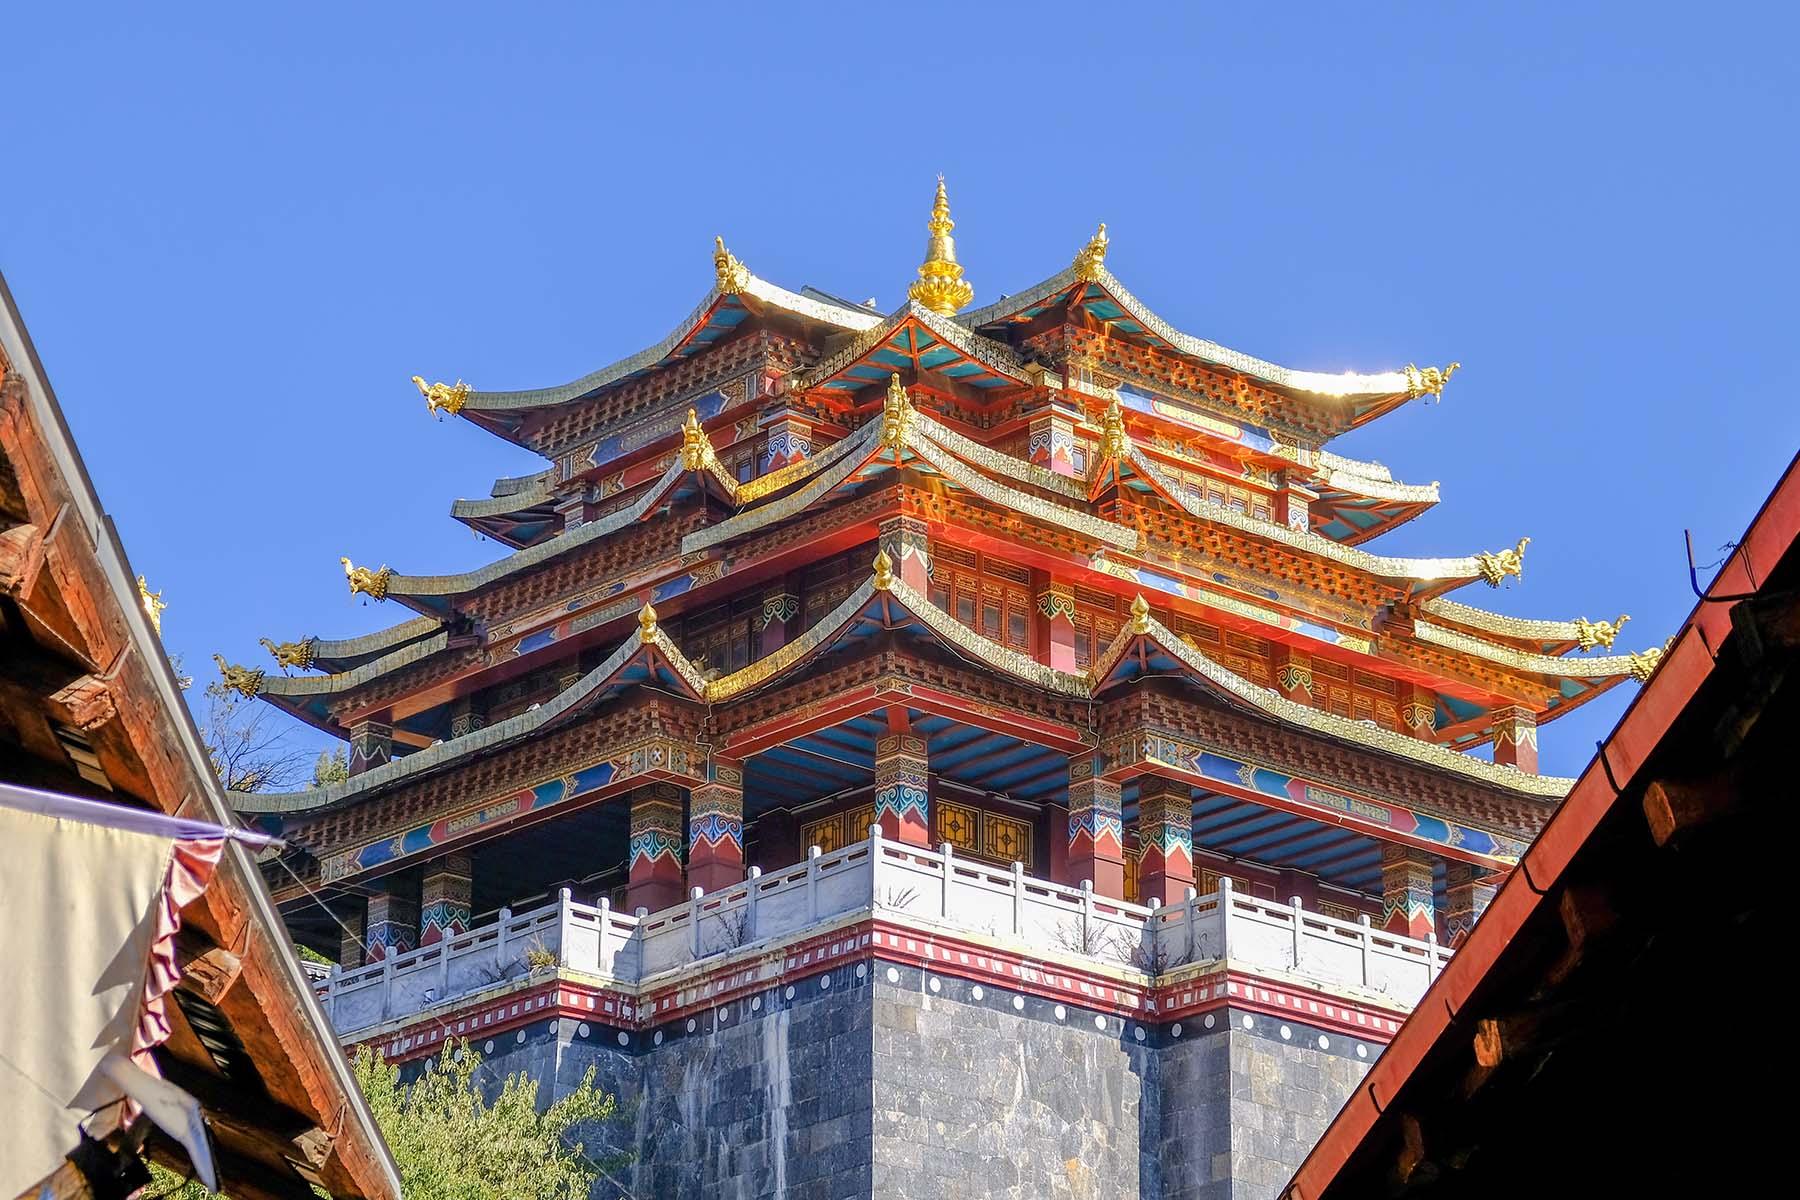 Guishan Tempel in der Altstadt von Shangrila, Yunnan